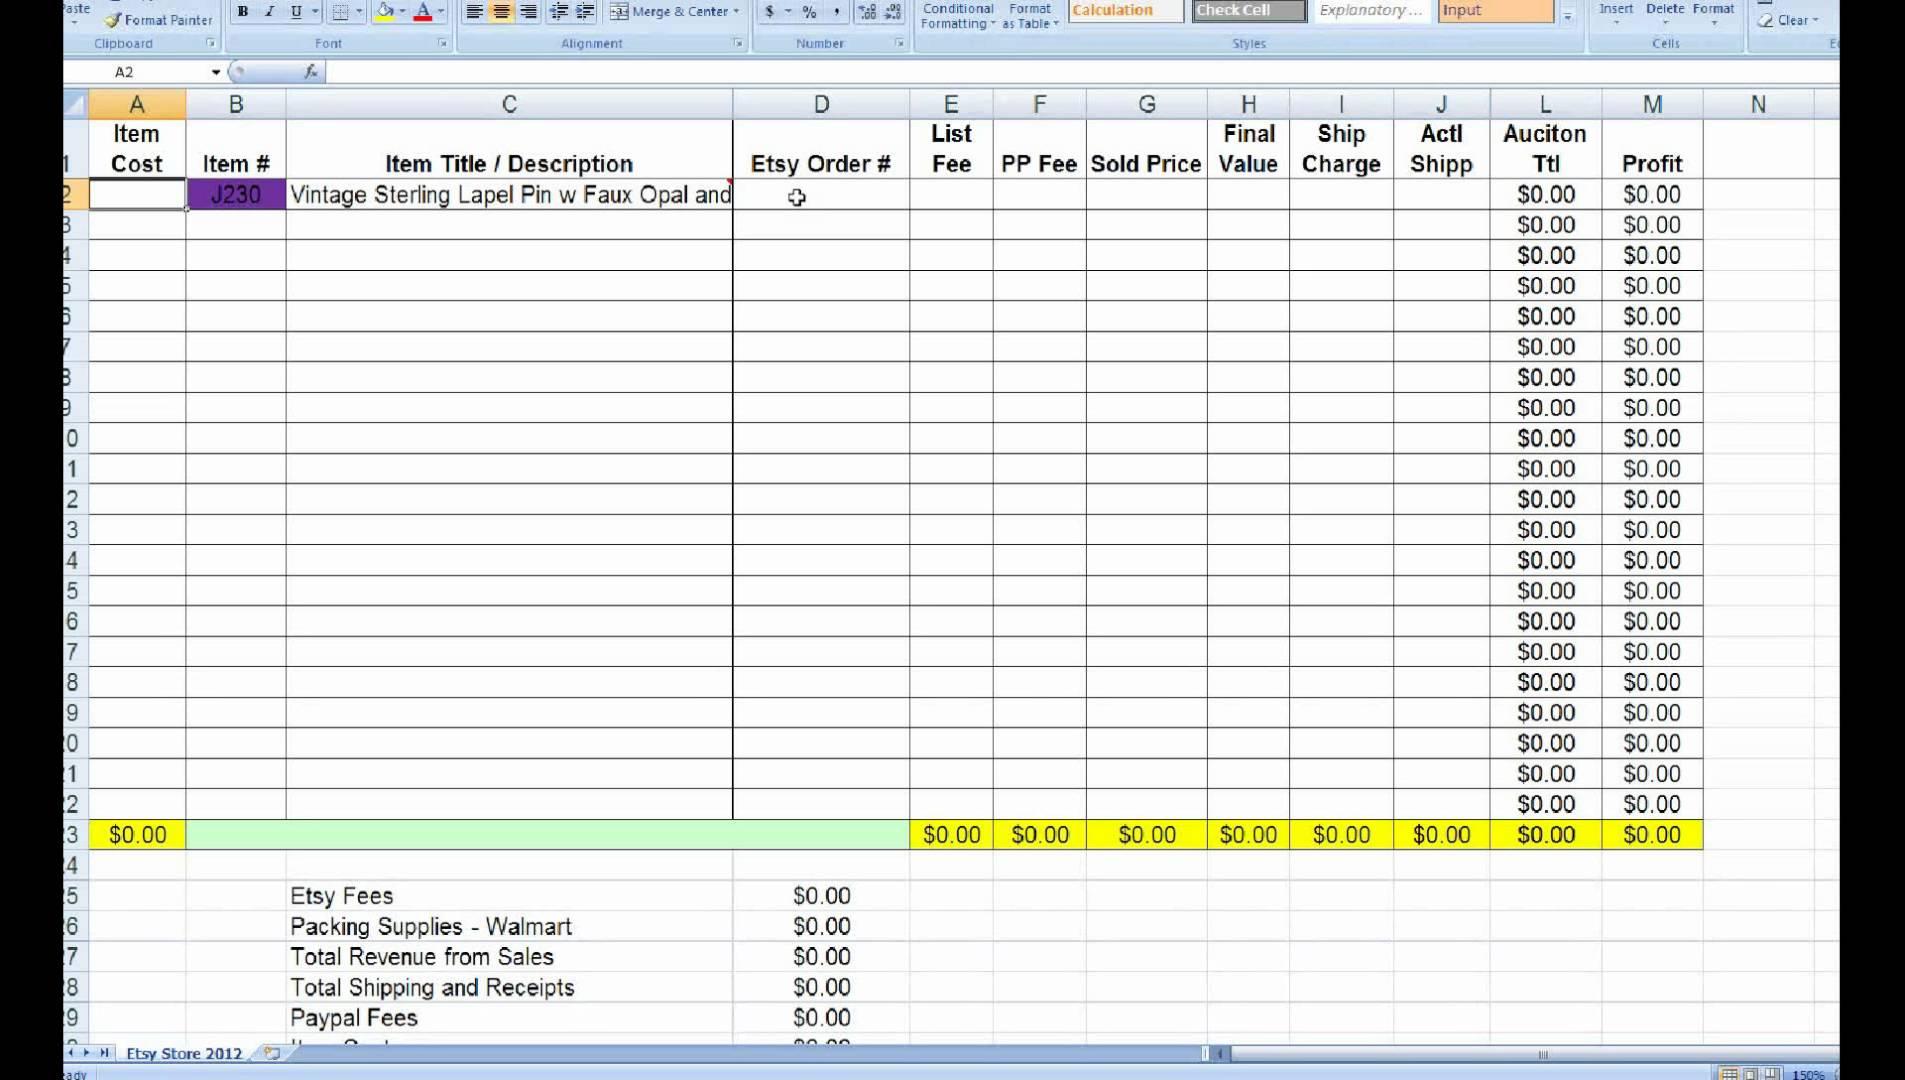 Lularoe Inventory Spreadsheet